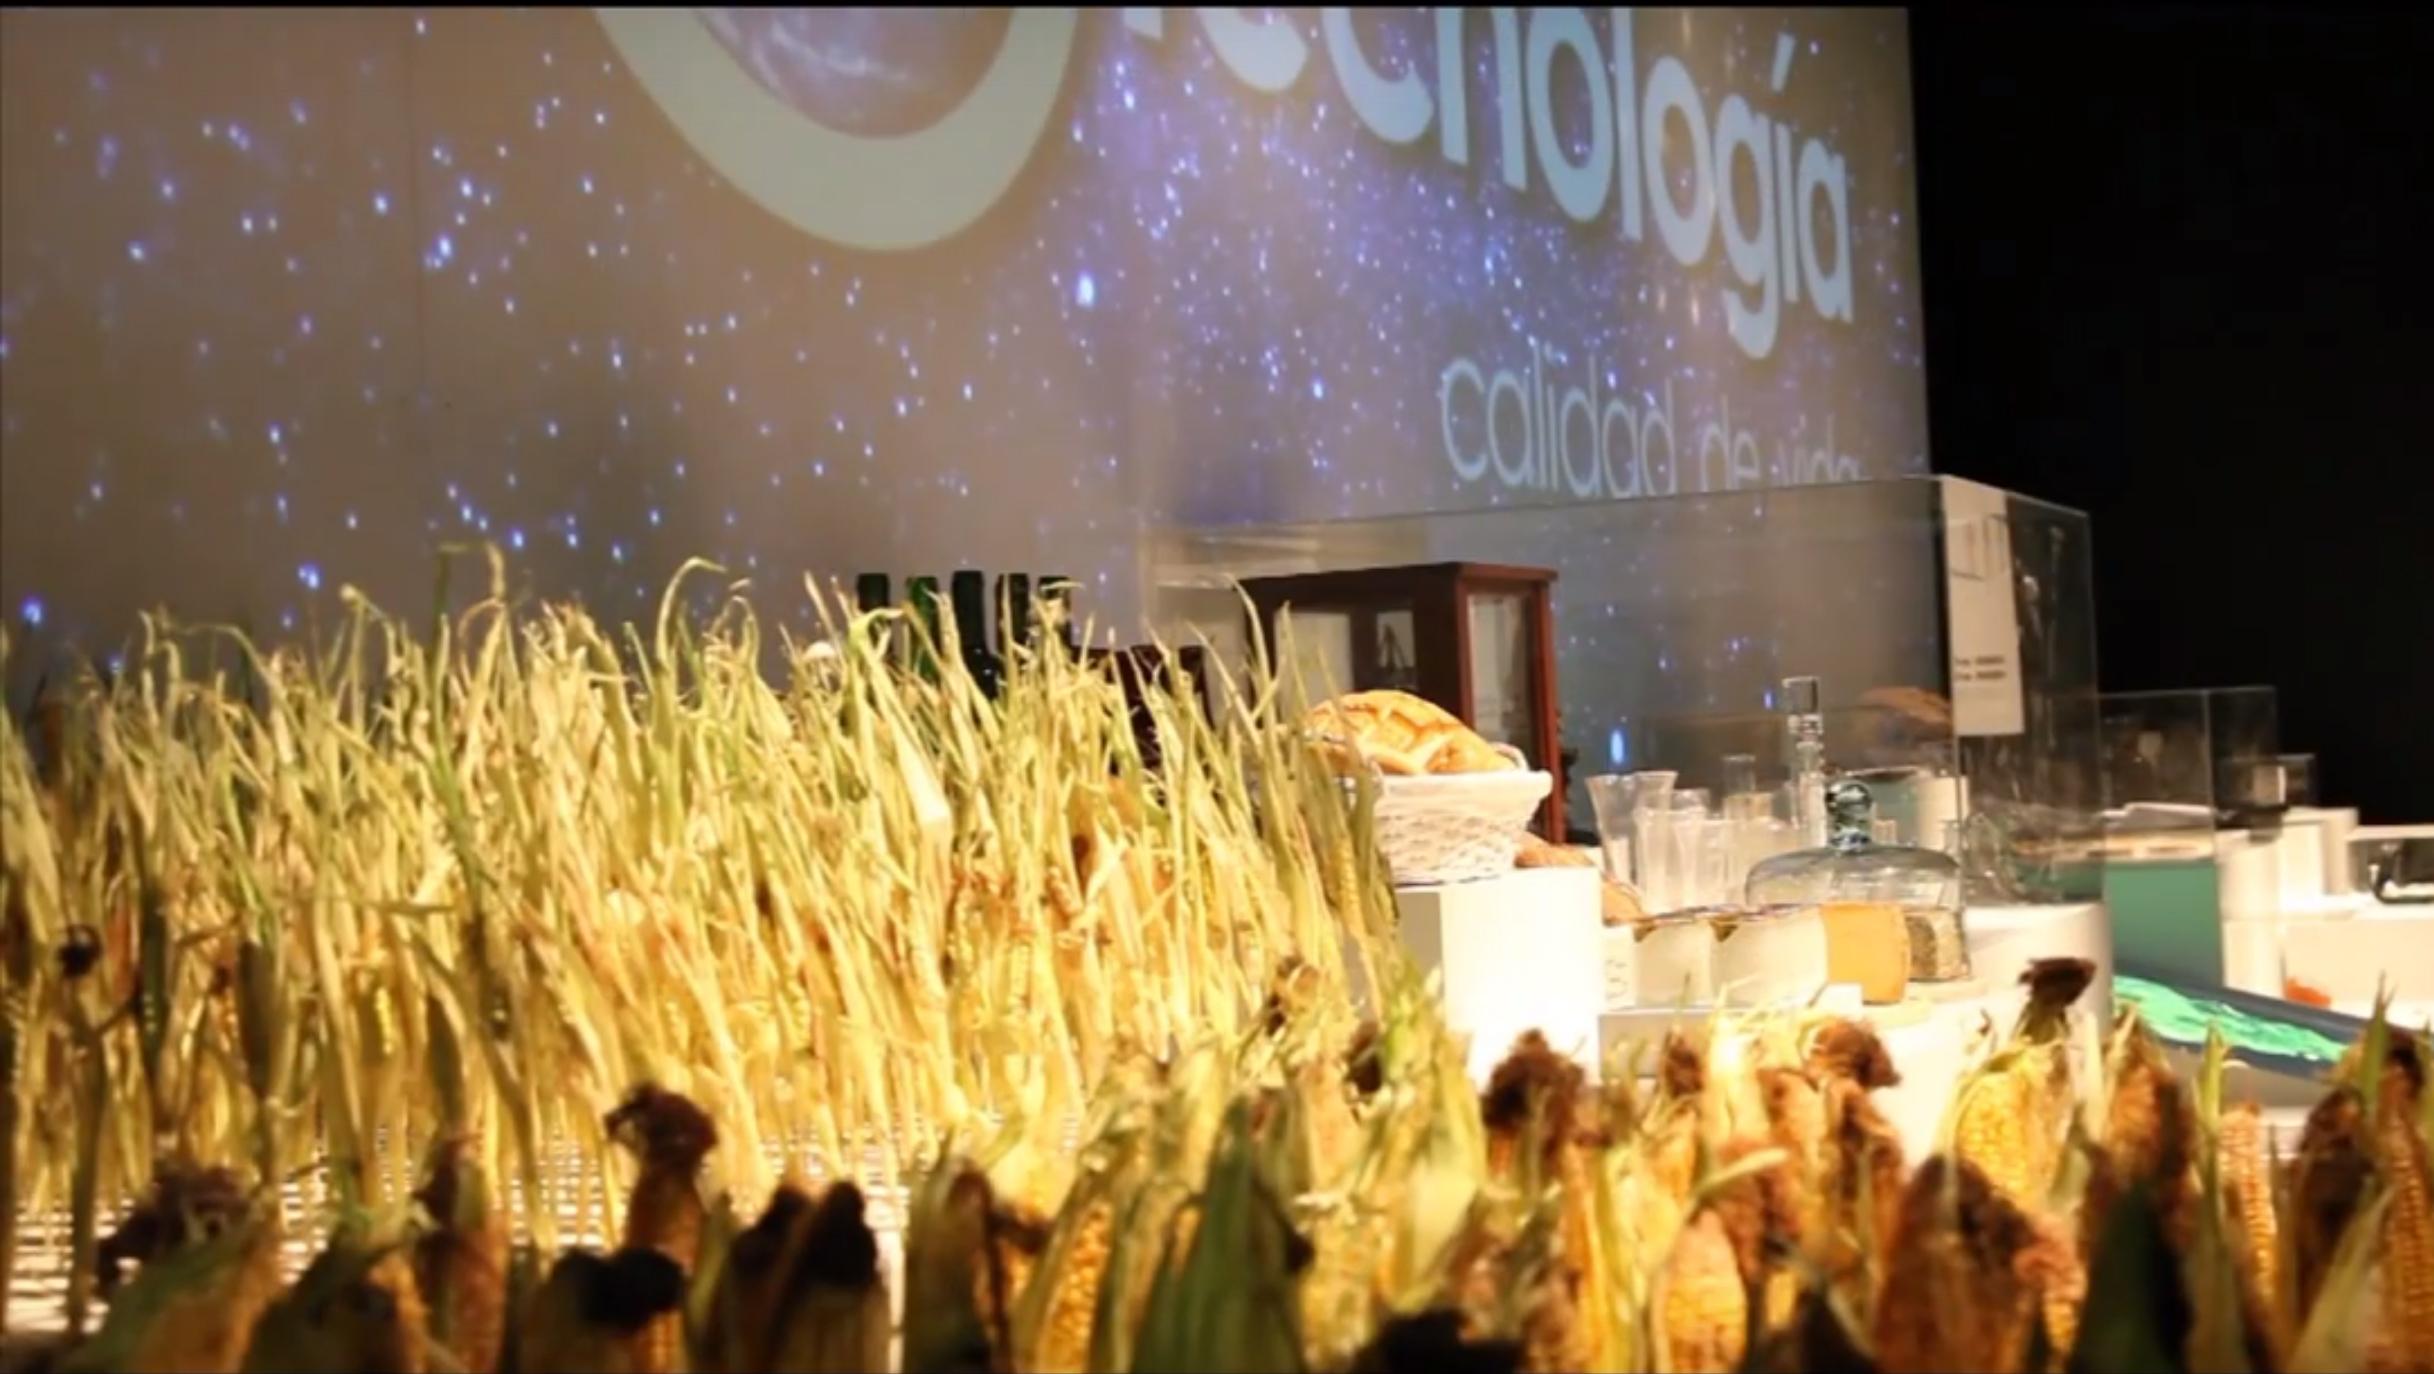 Exposición Biotecnología